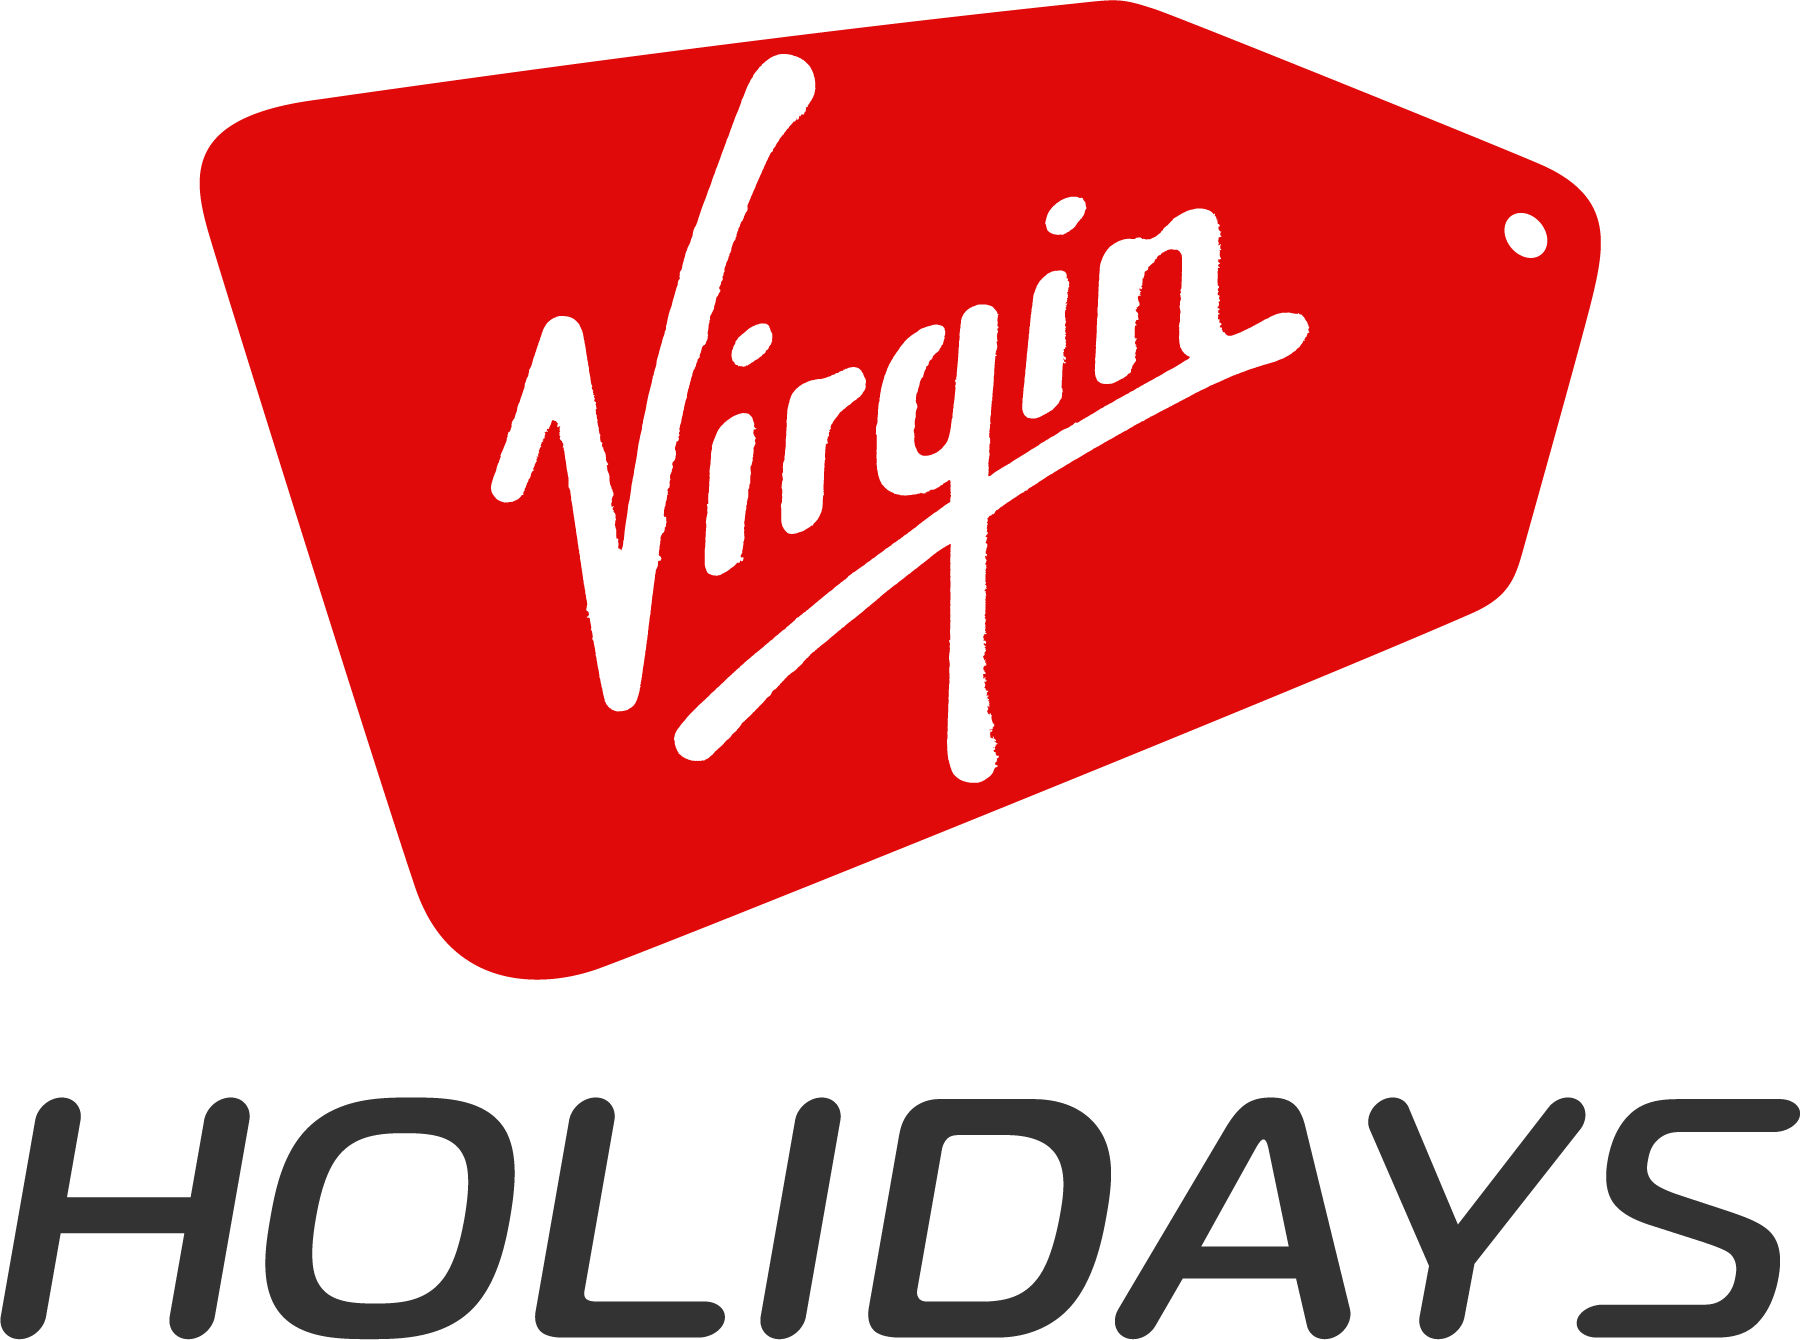 Virgin Holidays Chelmsford